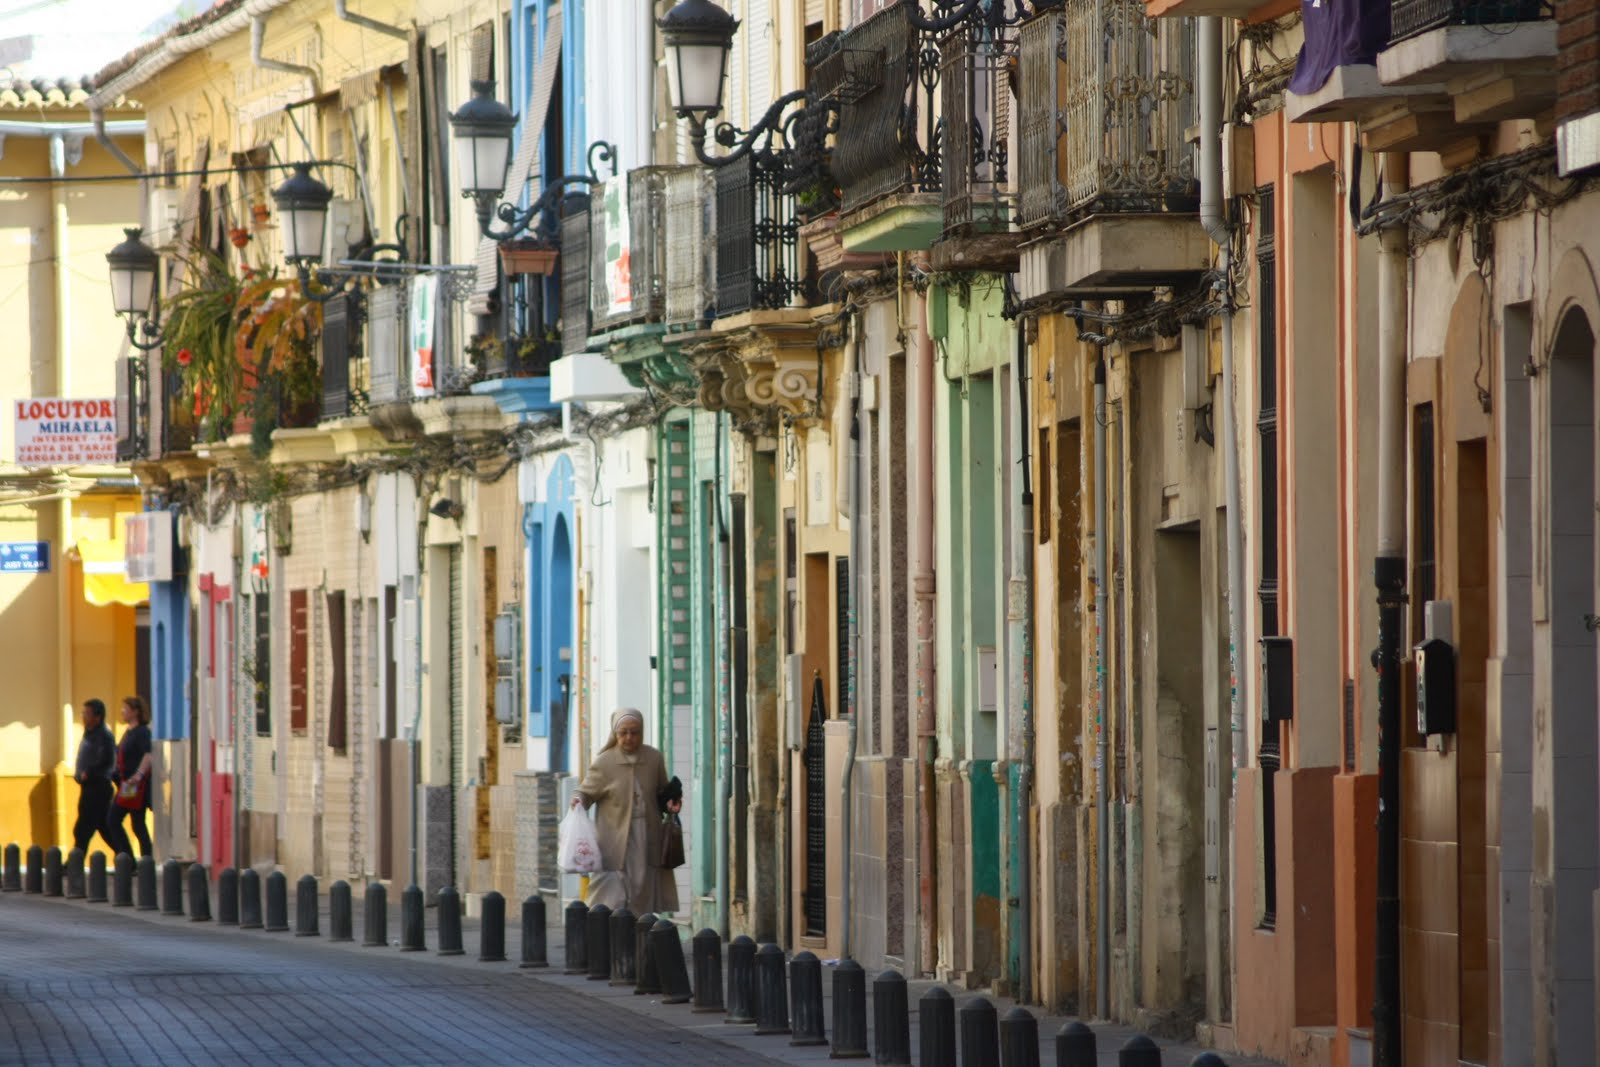 Les quartiers de valencia poblats maritims expat valencia - Casa de pueblo en valencia ...